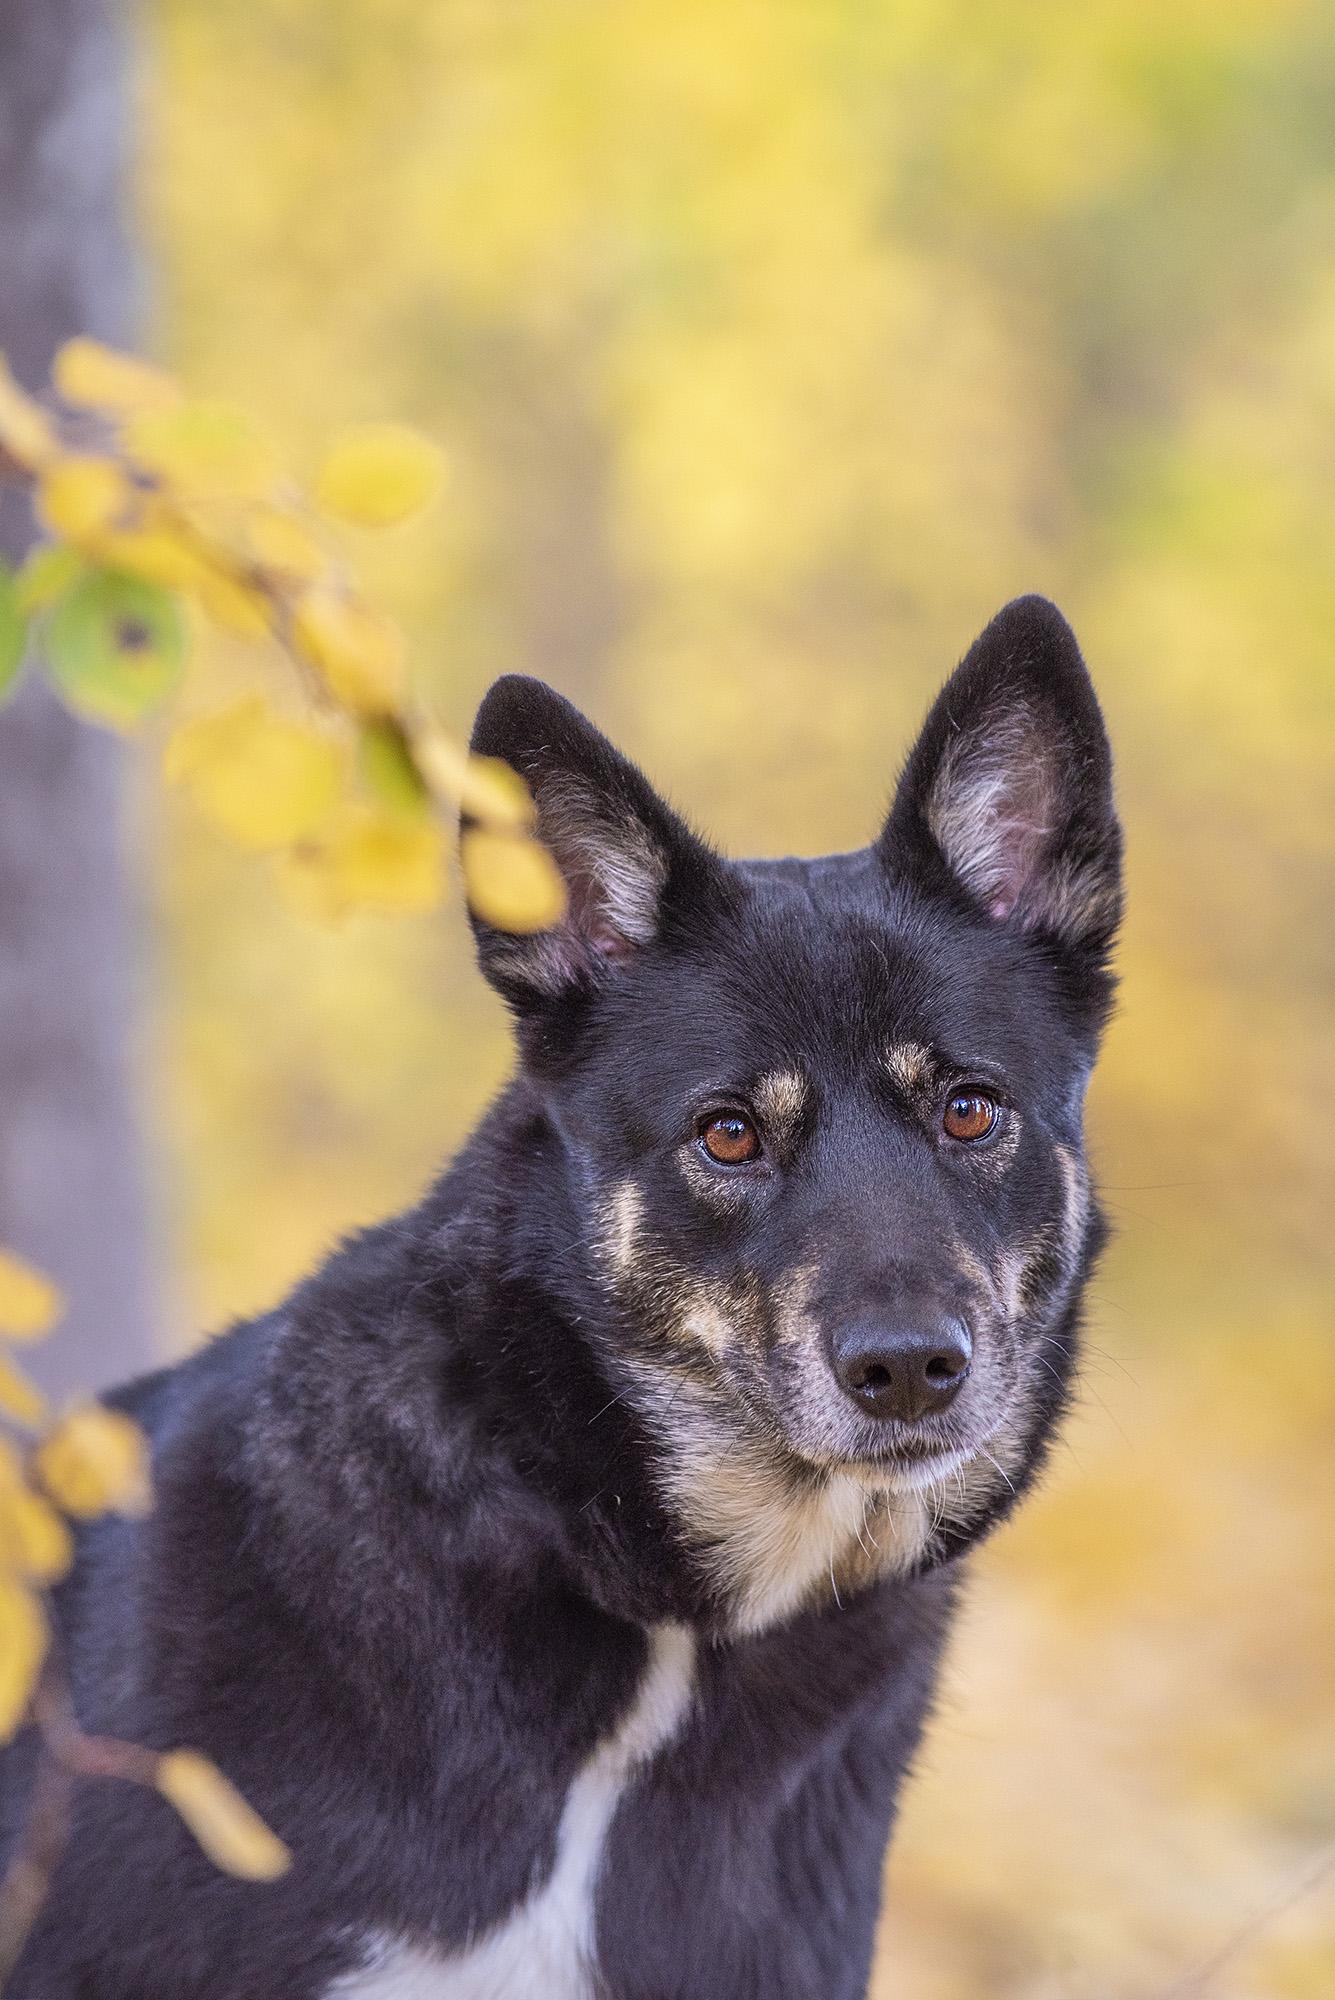 valokuvaus koirakuvaus potrettikuvaus